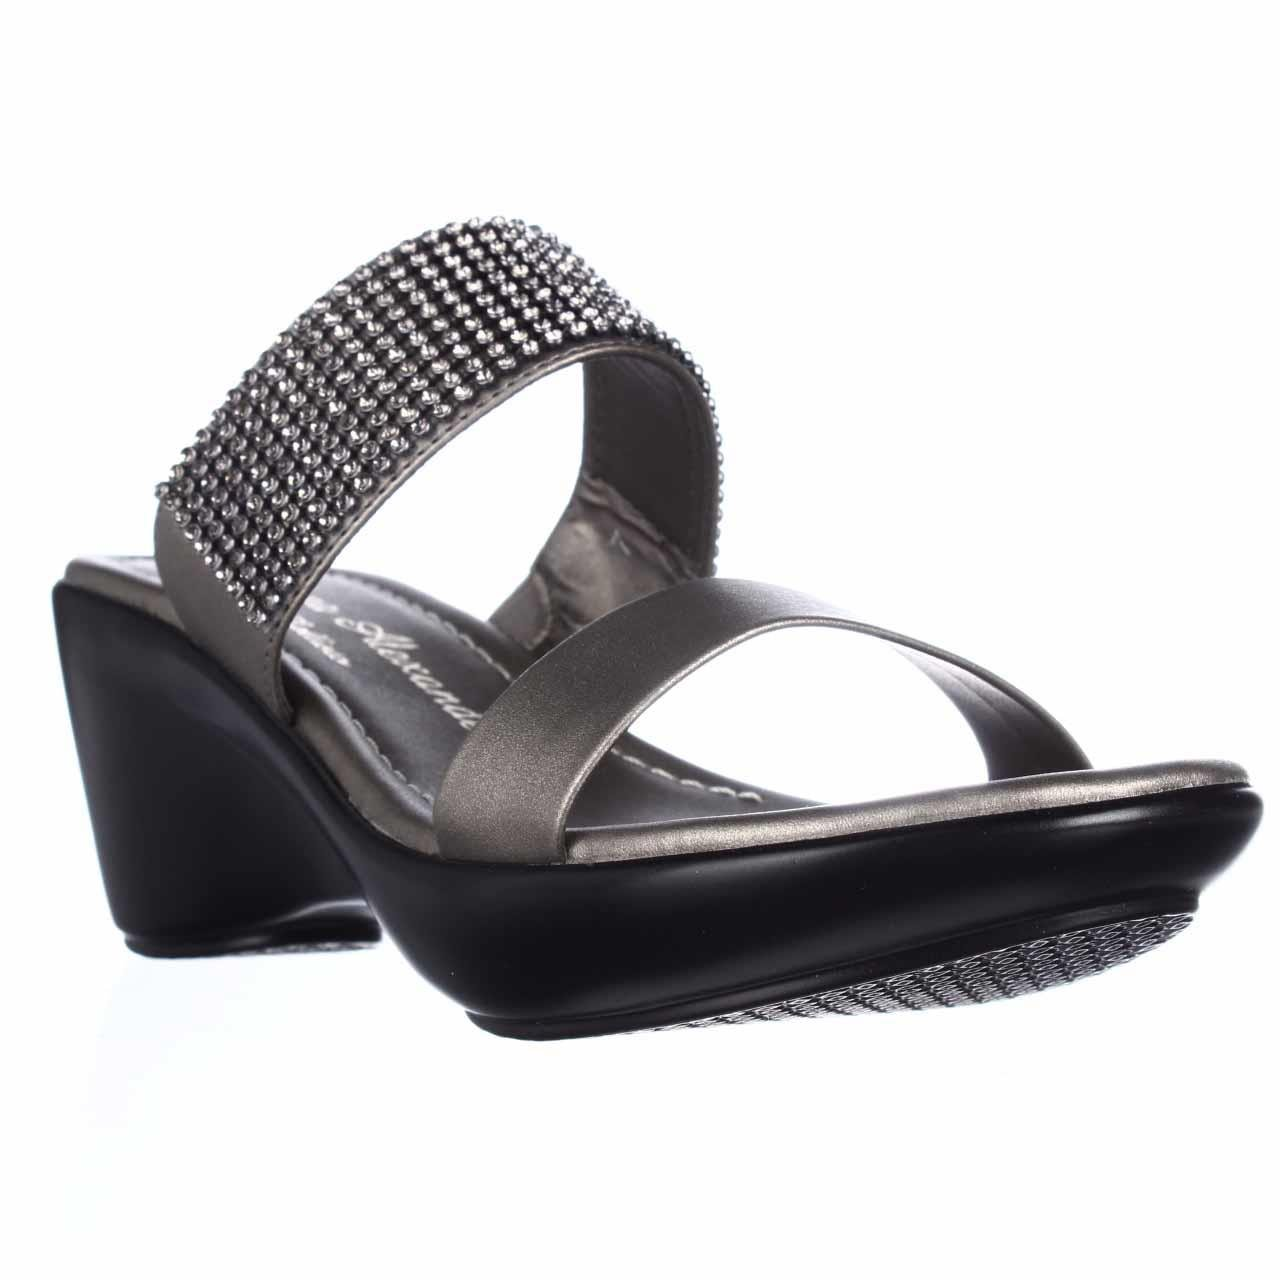 Callisto Womens jezzie Open Toe Casual Mule Sandals B07BC7PJYR 5 B(M) US|Pewter